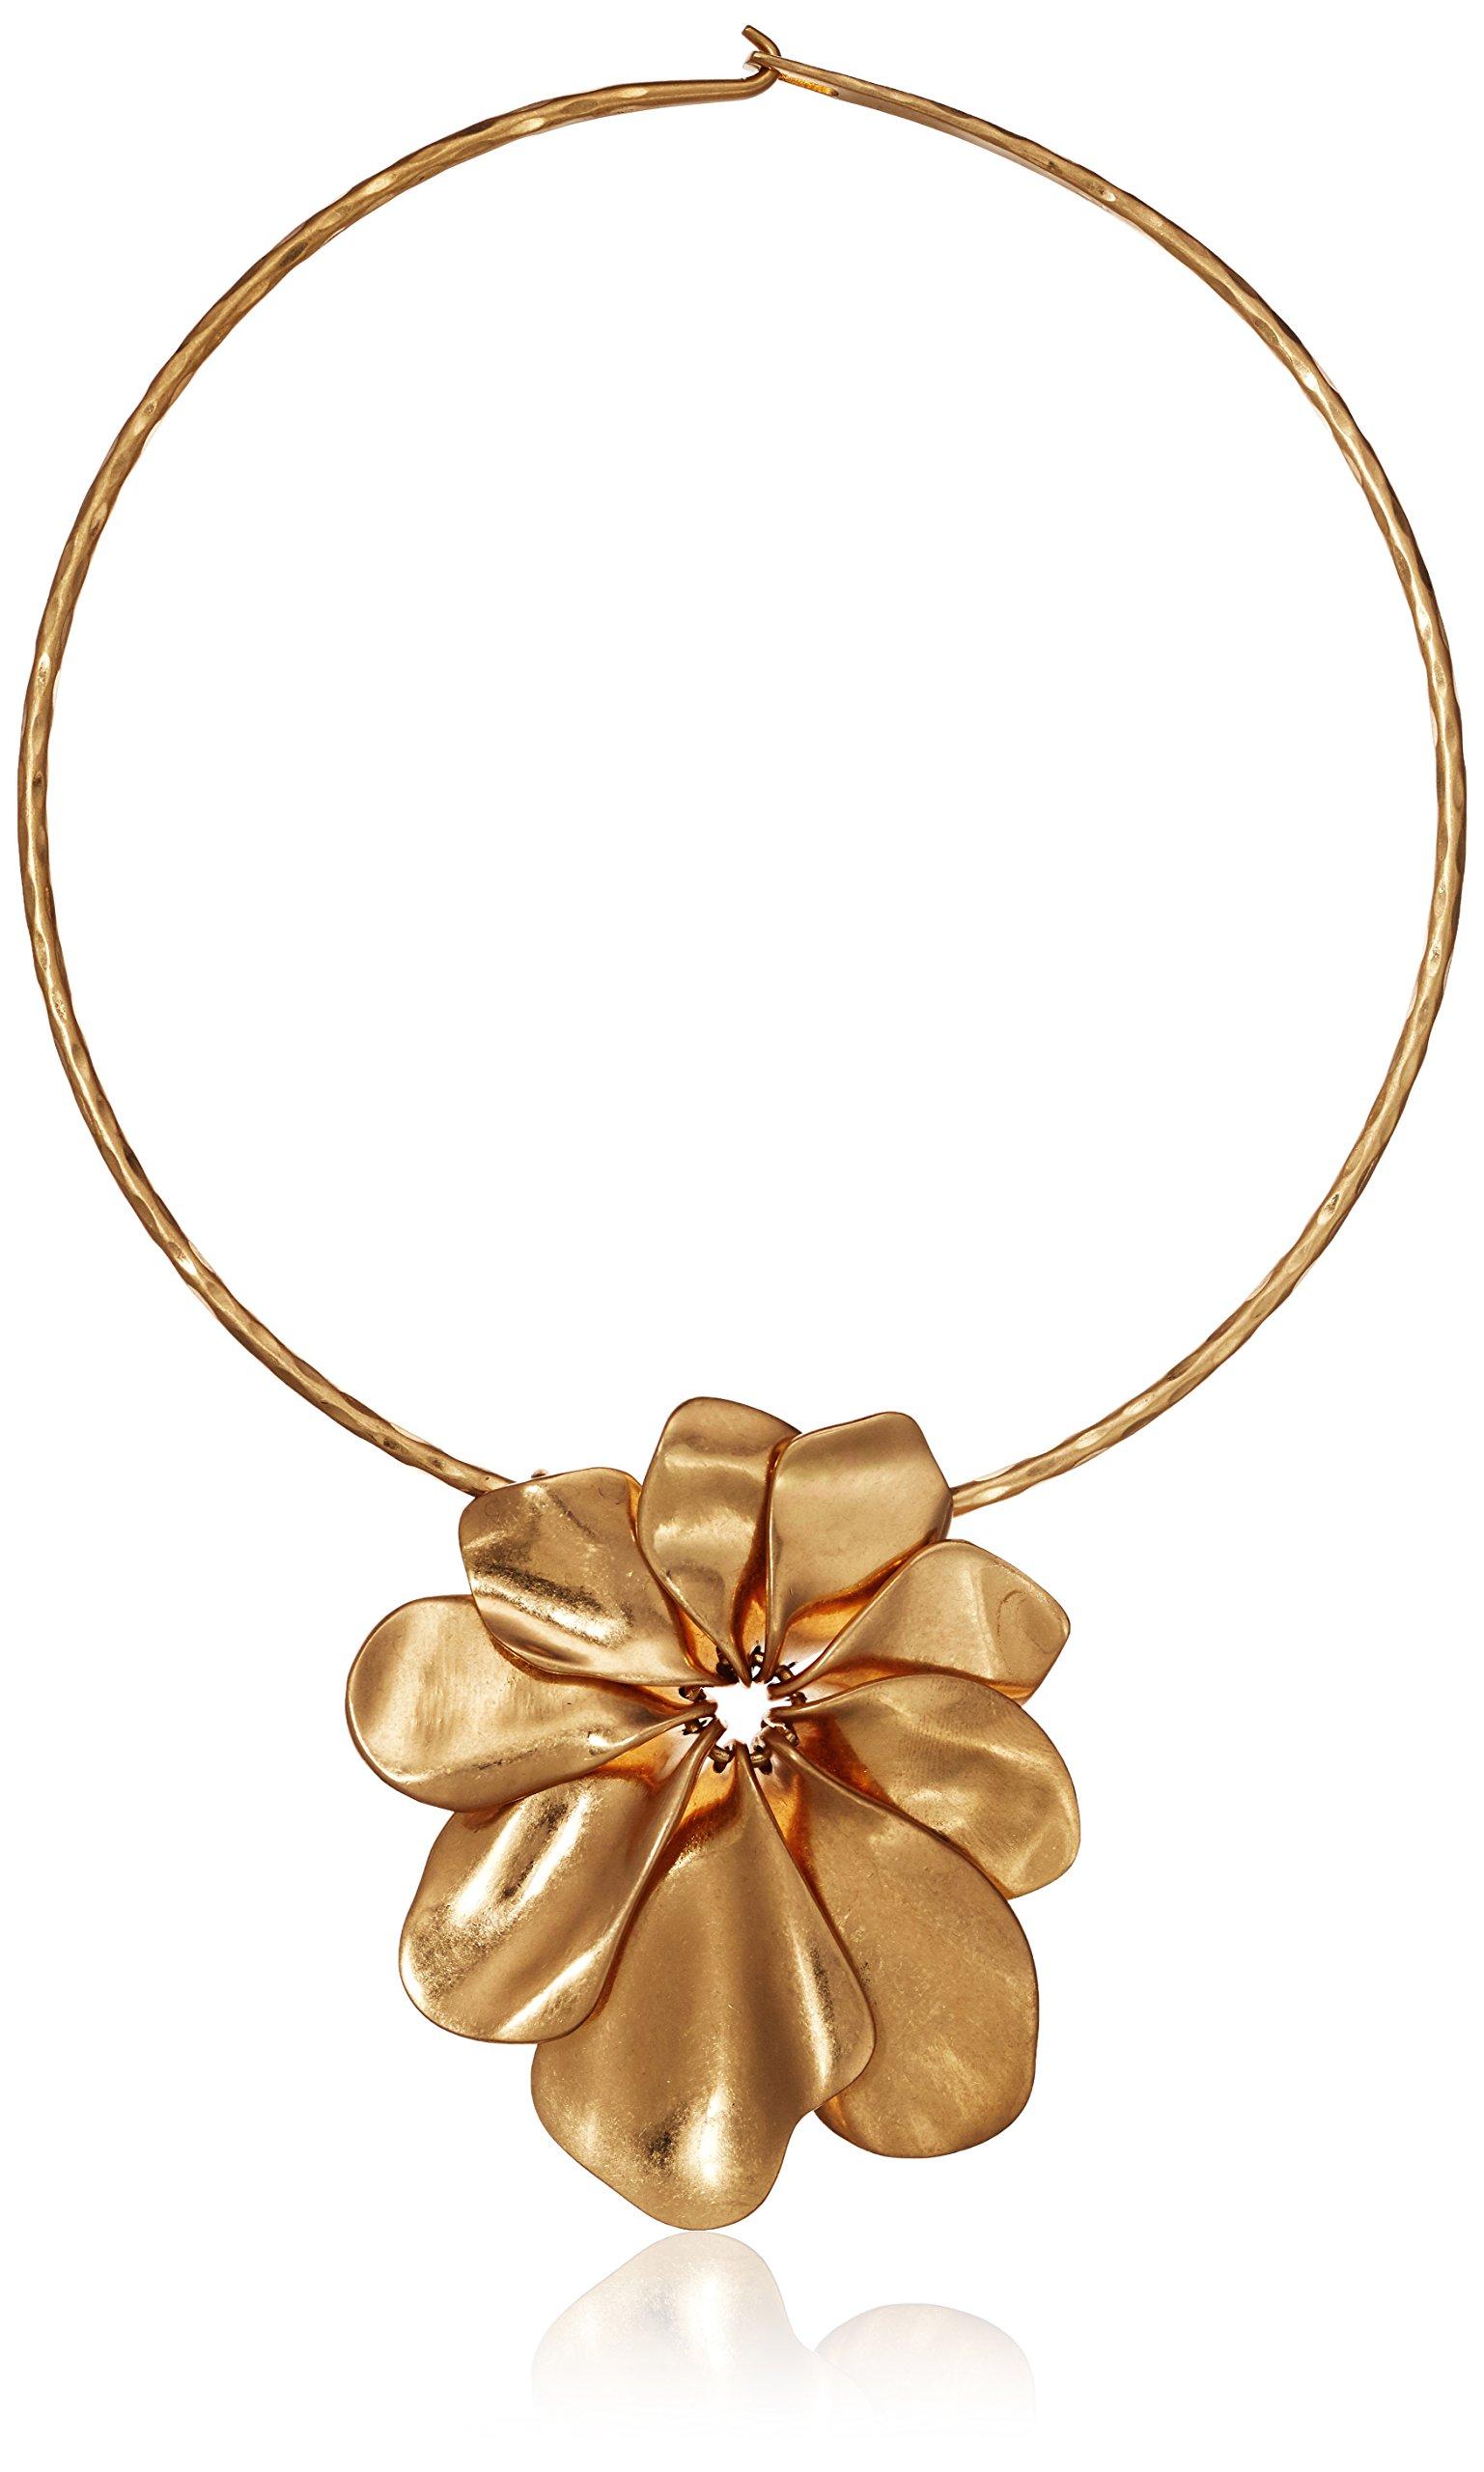 Robert Lee Morris Women's Sculptural Flower Wire Collar Gold Necklace Pendant Enhancer, One Size